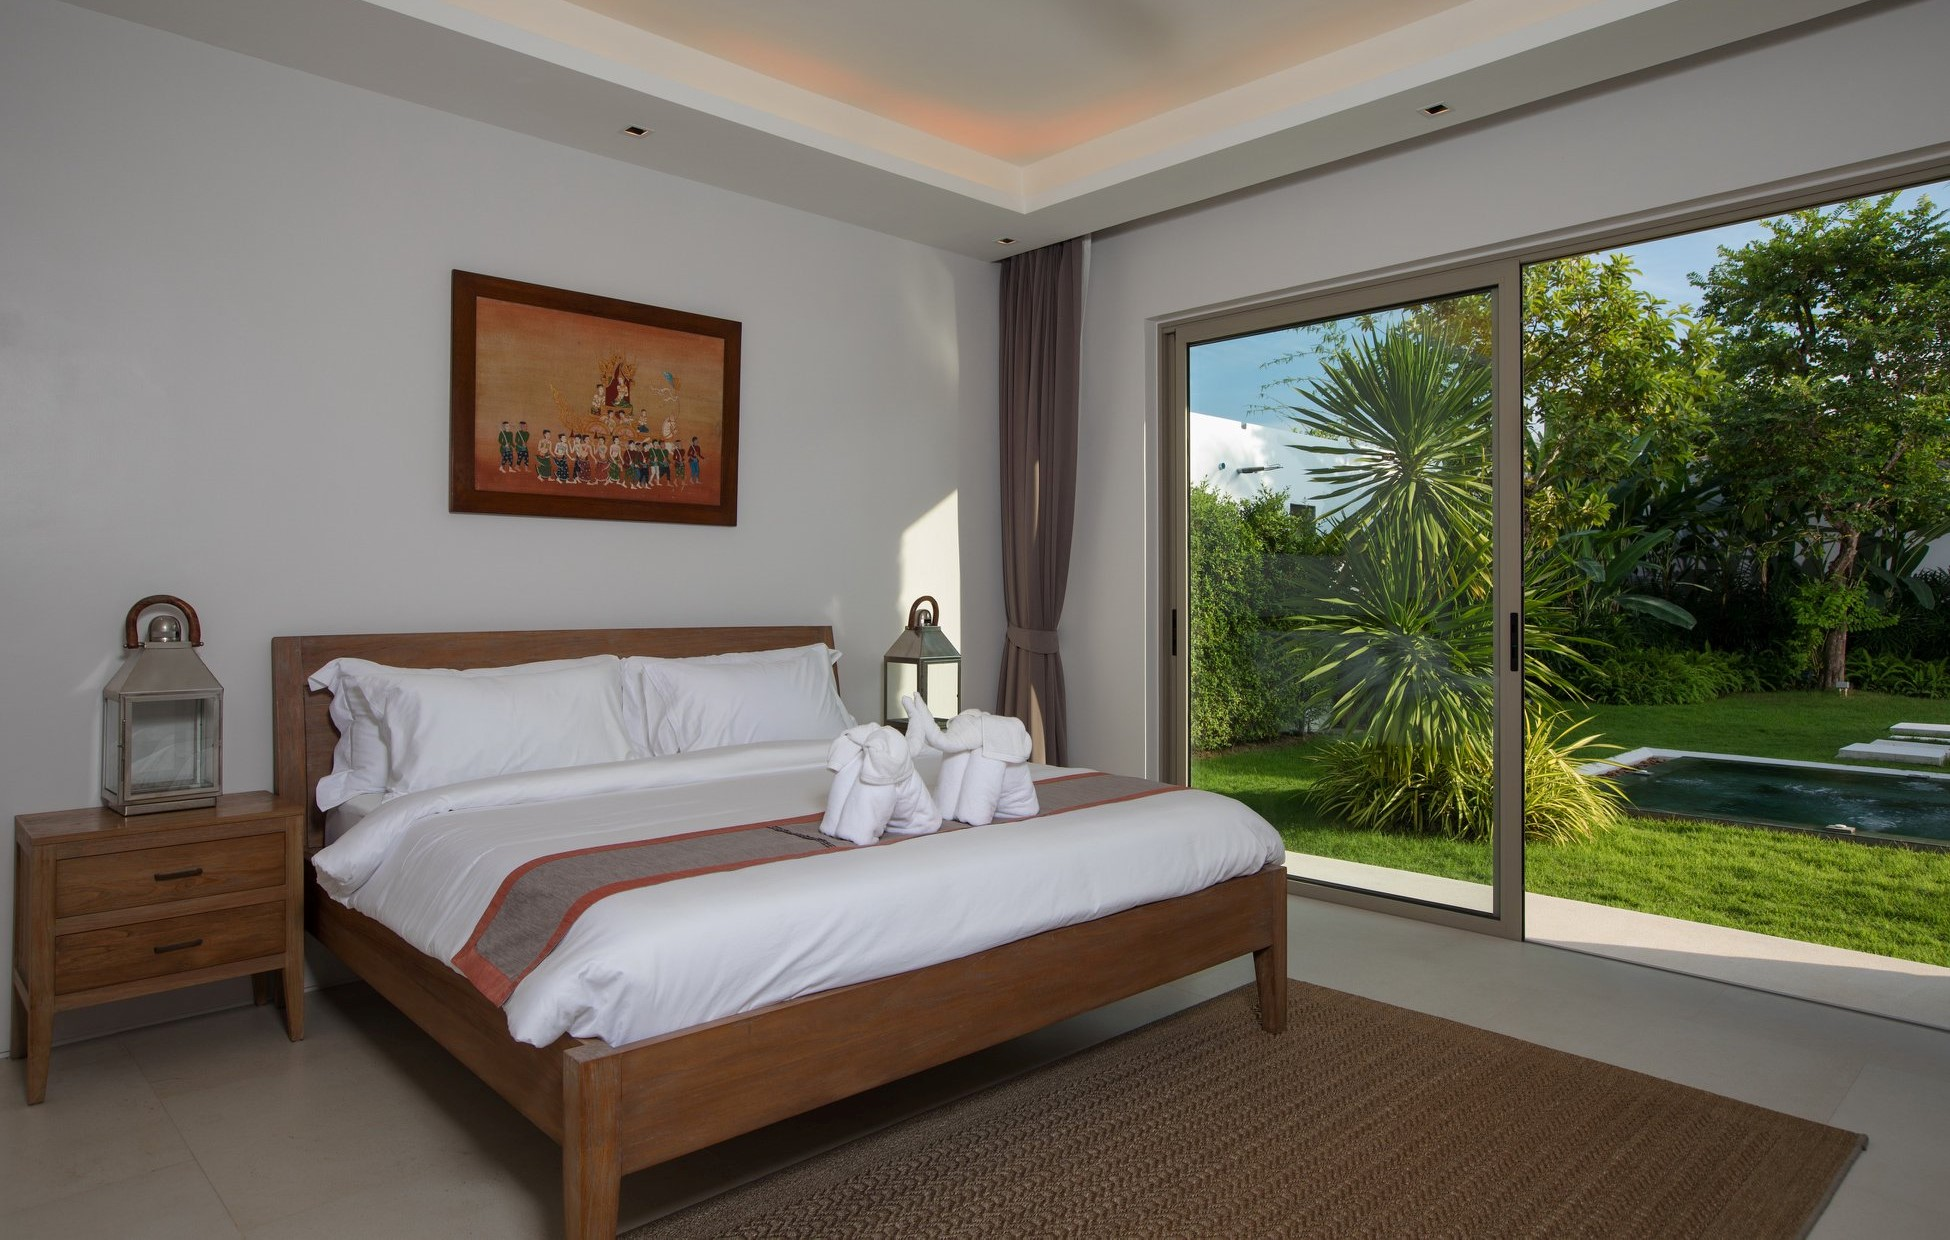 Phuket Real Eastate Agency – Laguna (3)